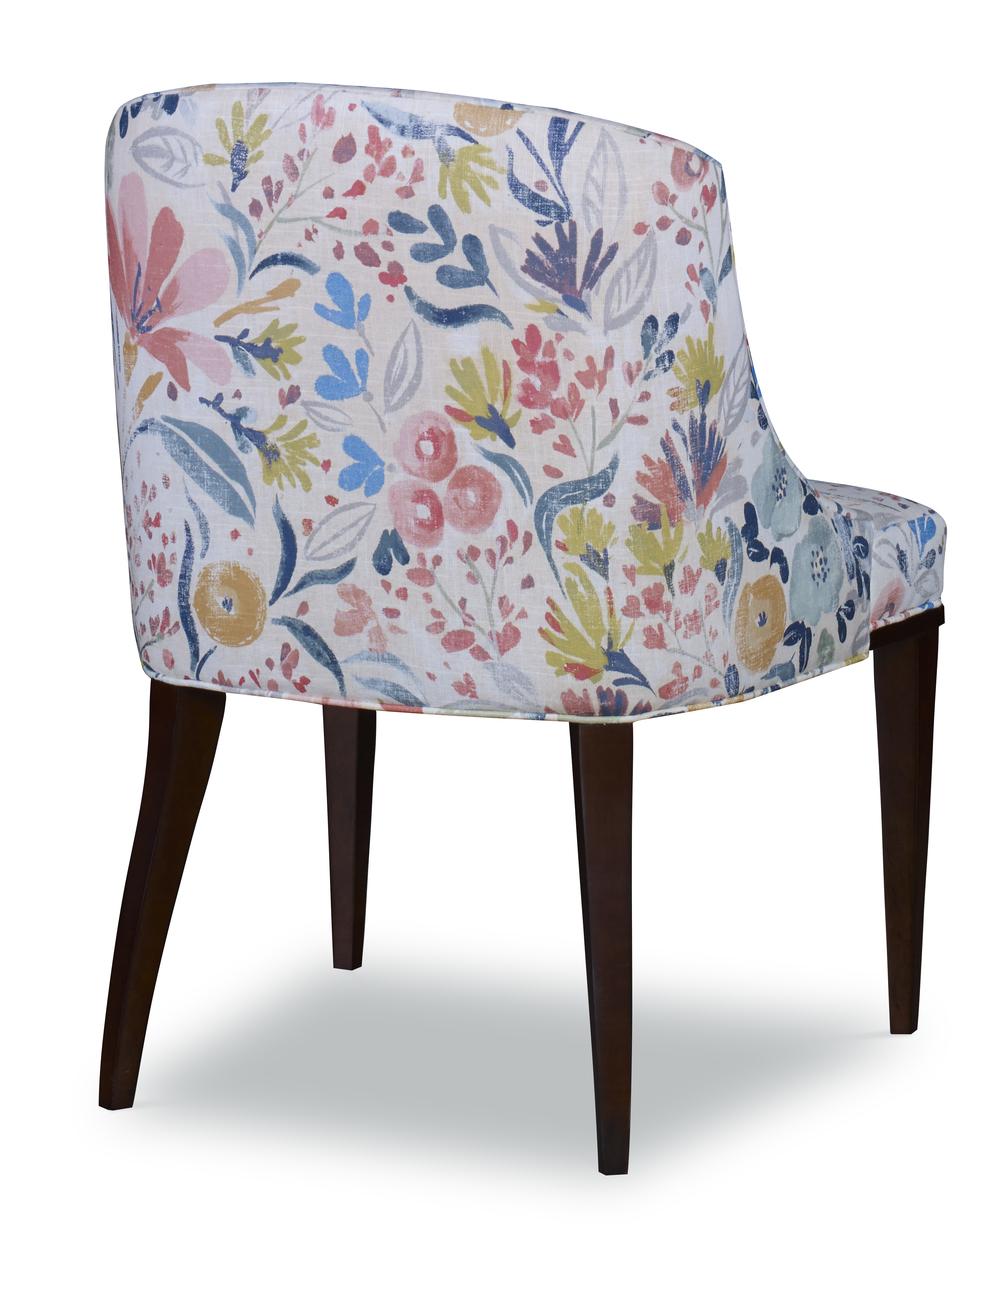 Highland House - Becker Dining Chair